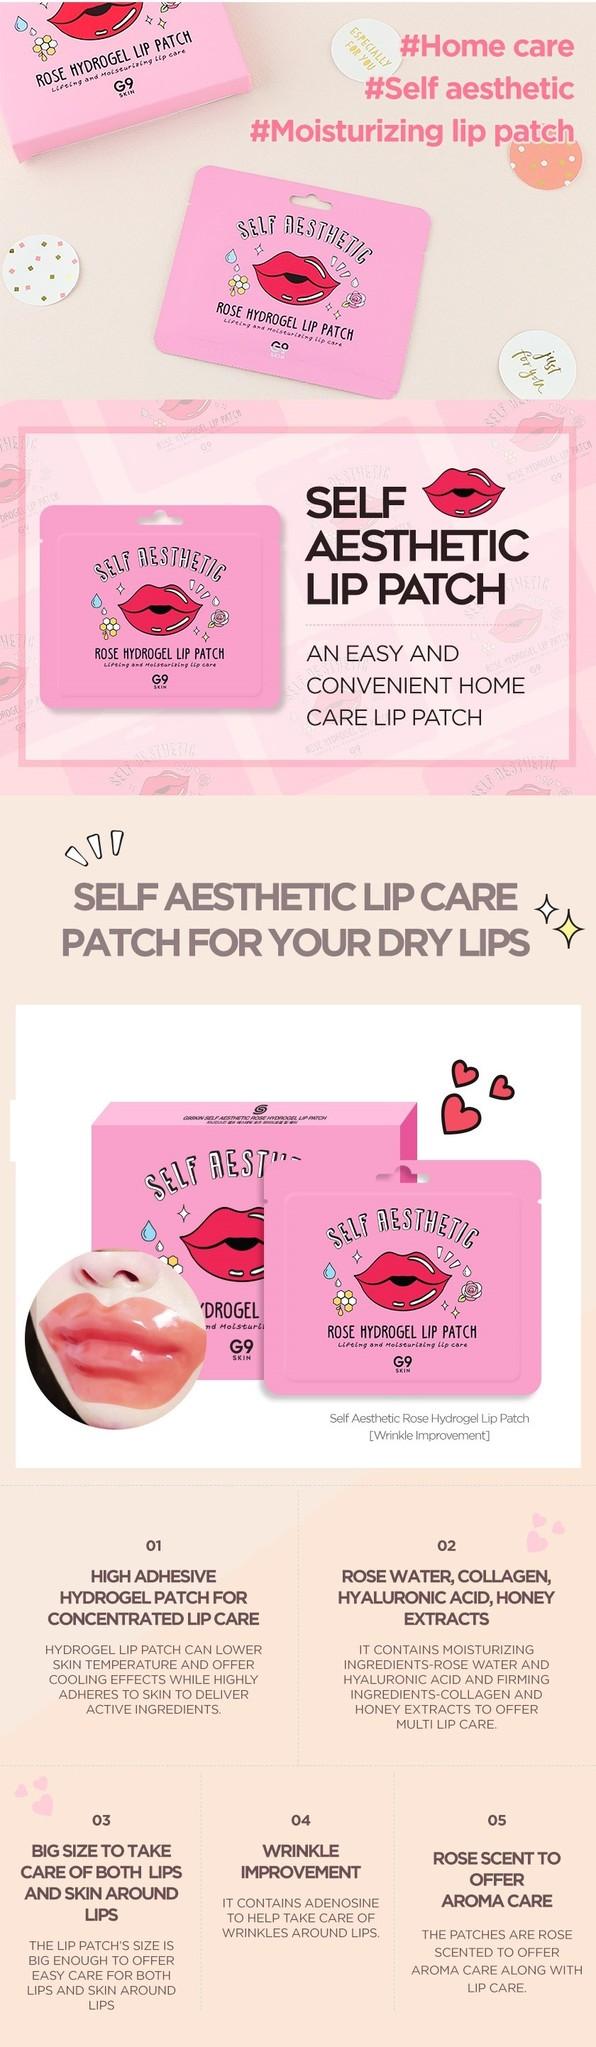 Self Aesthetic Rose Hydrogel Lip Patch-3